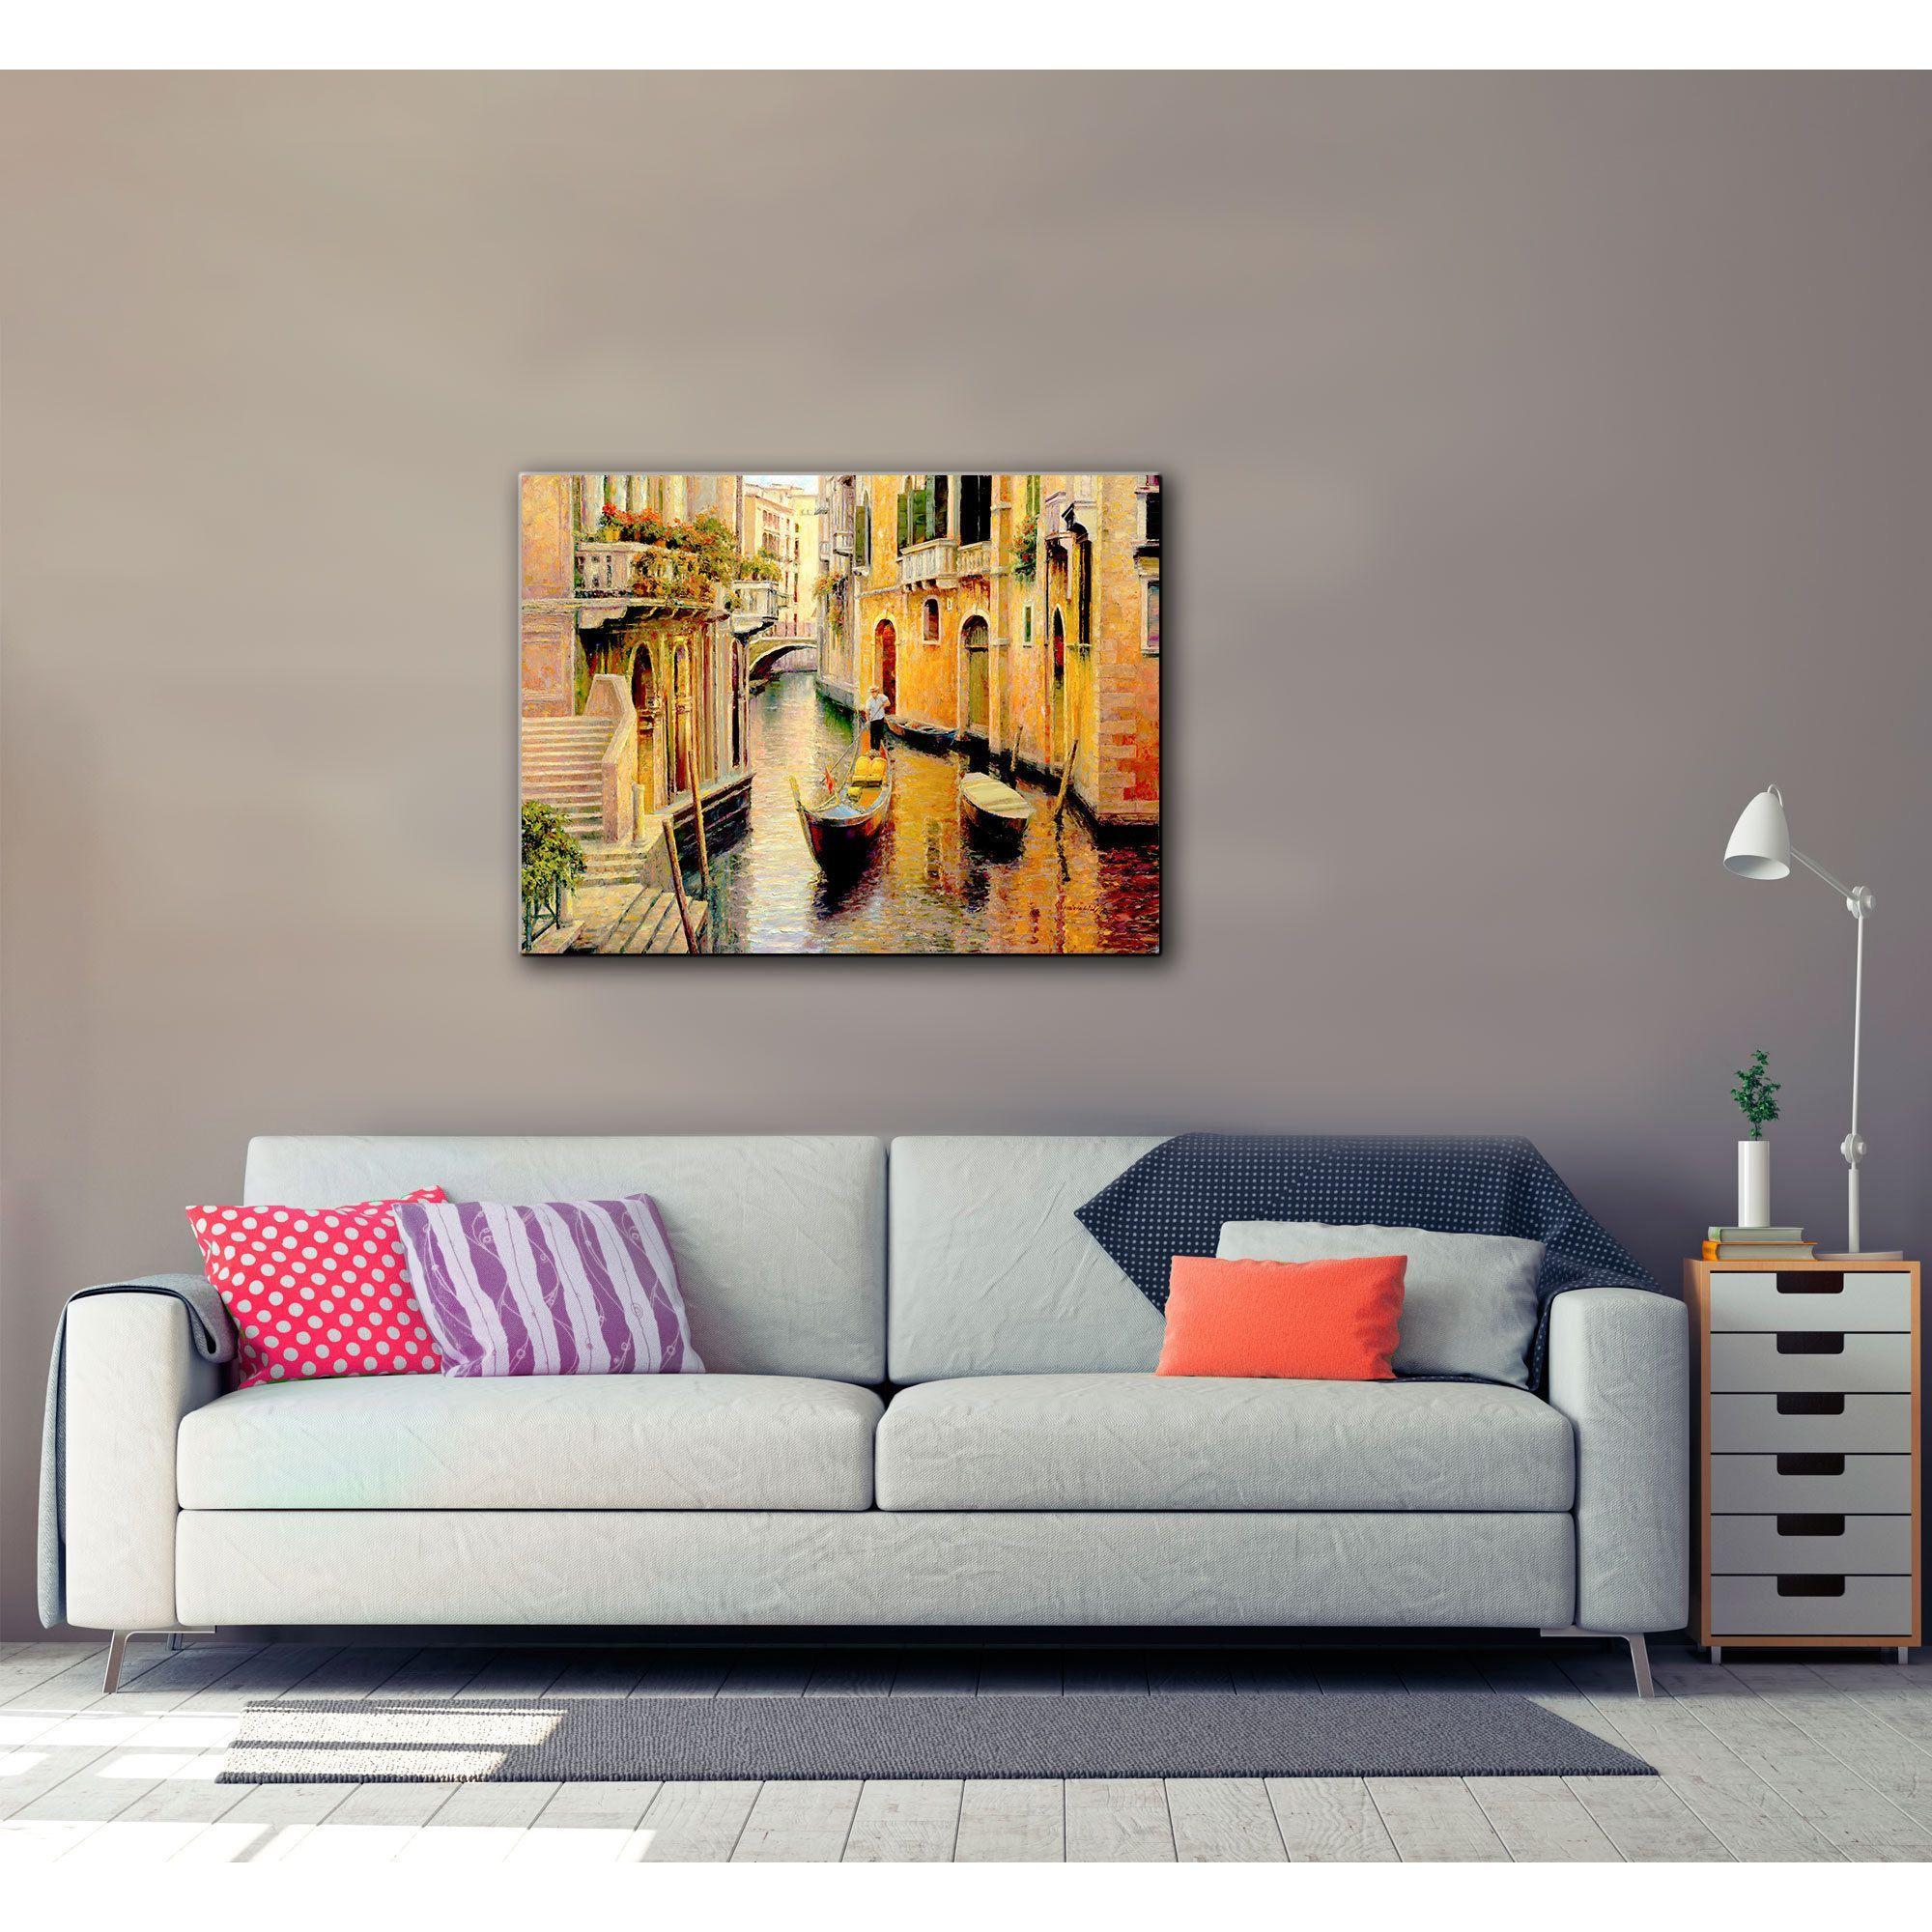 Artwall uhaixia liuus golden evening gondolau gallery wrapped canvas